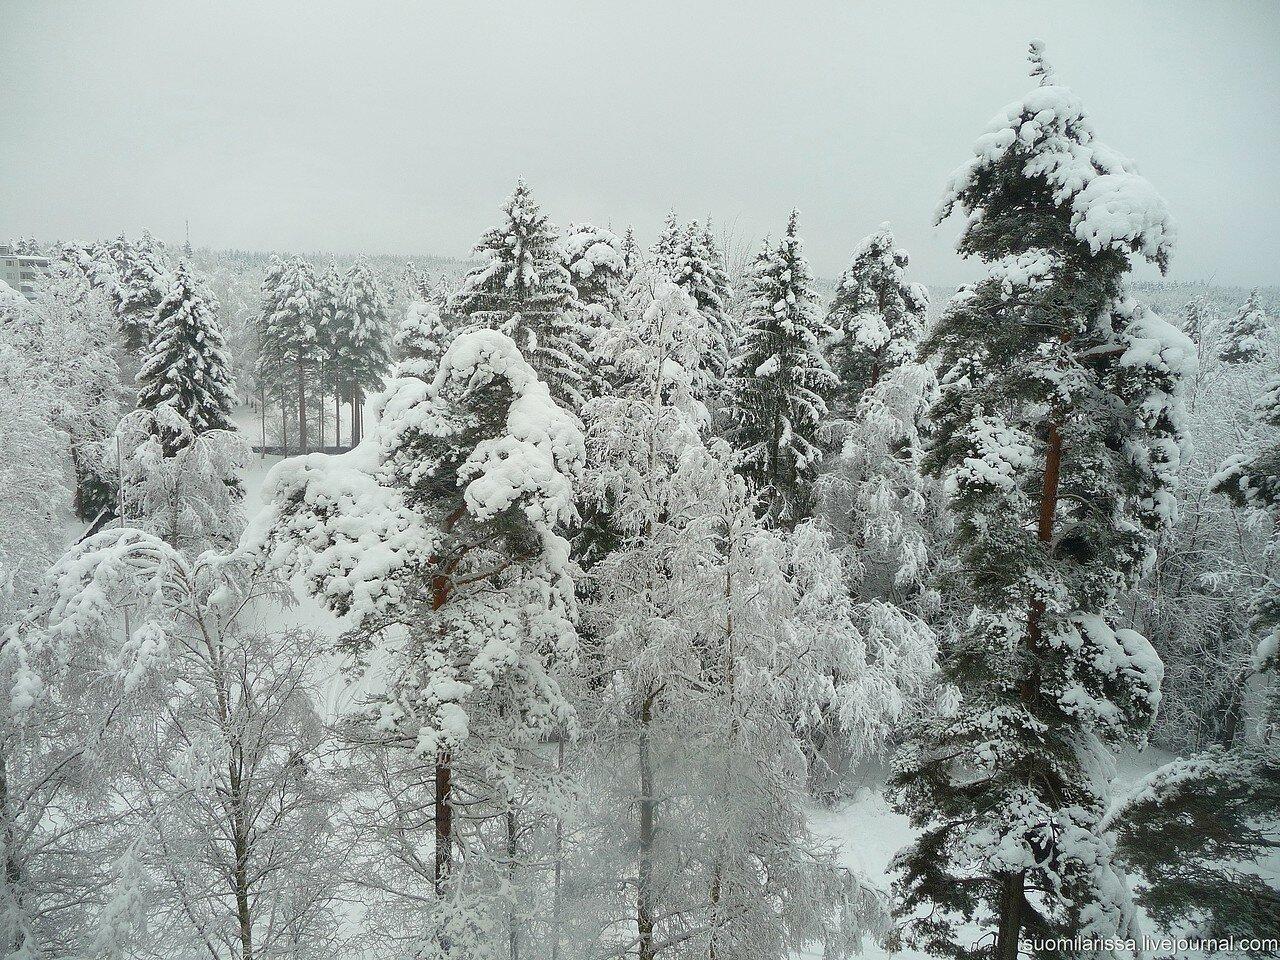 Kouvola, 3.02.2015